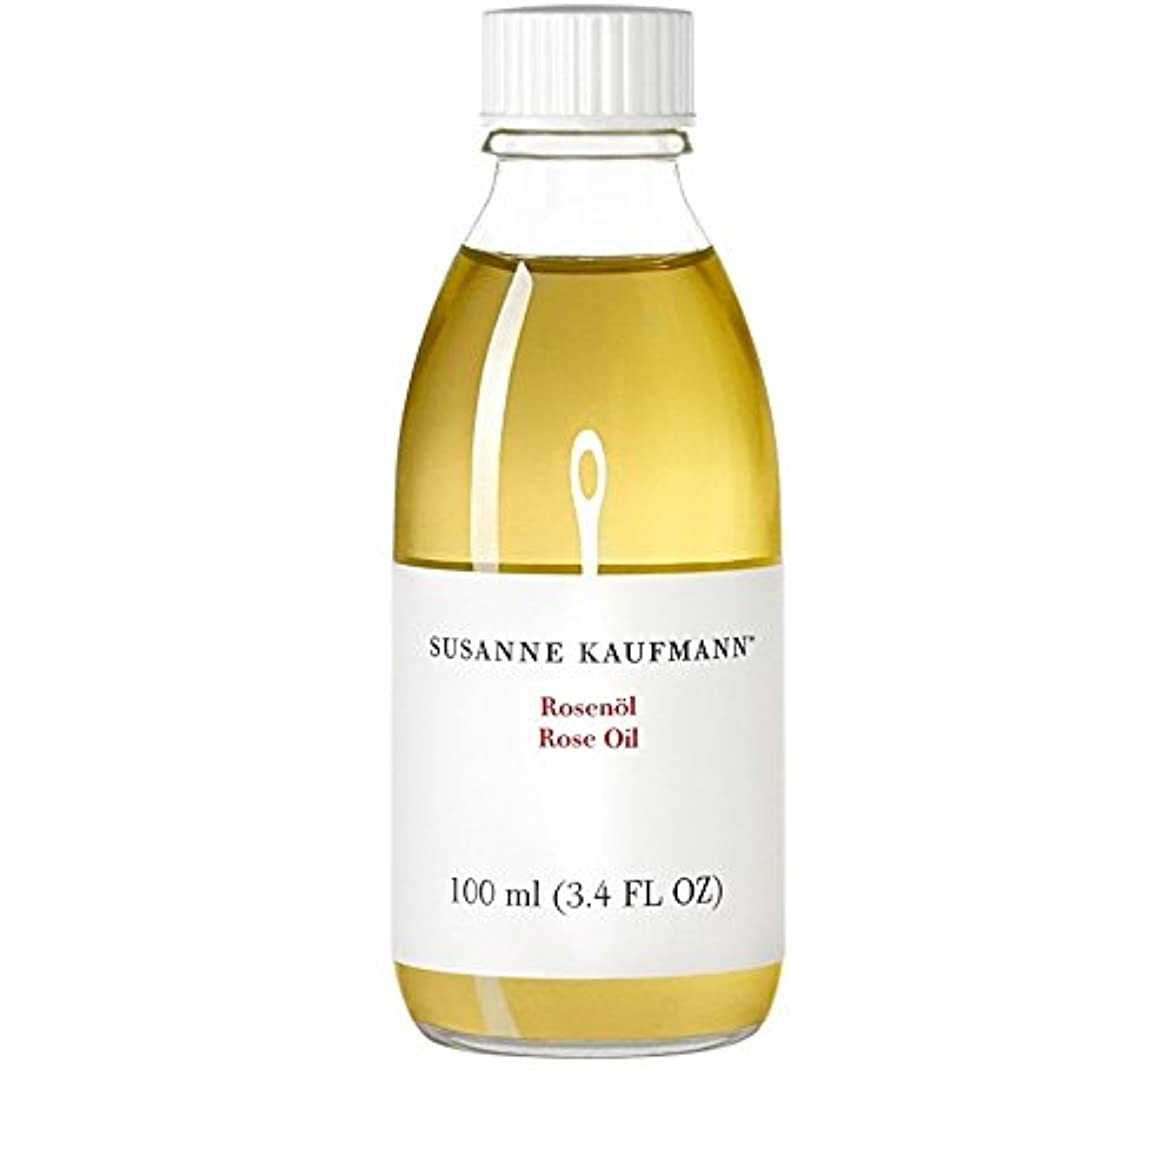 Susanne Kaufmann Rose Oil 100ml (Pack of 6) - スサン?カウフマンオイル100ミリリットルをバラ x6 [並行輸入品]